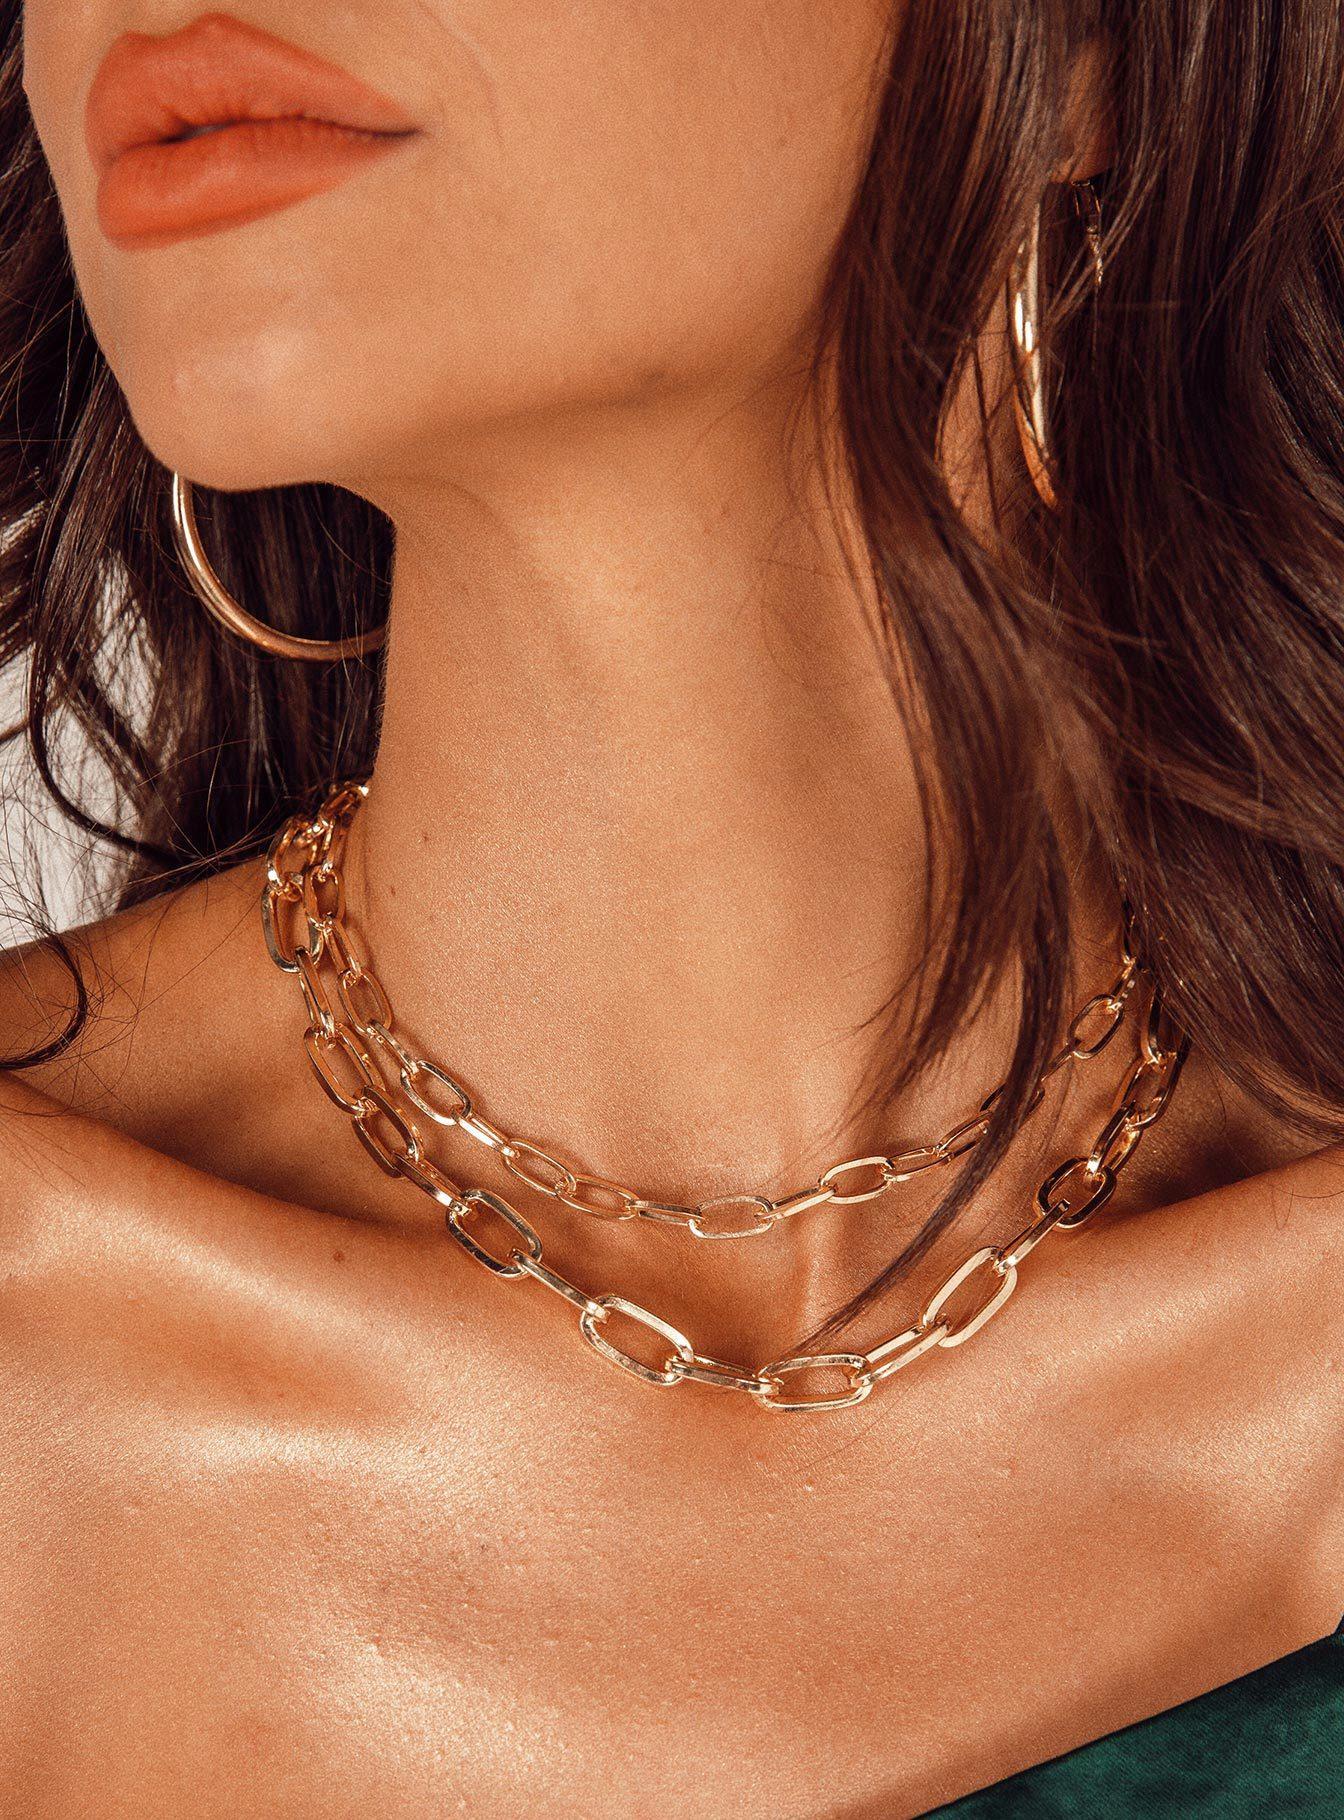 Necklaces (Side A)